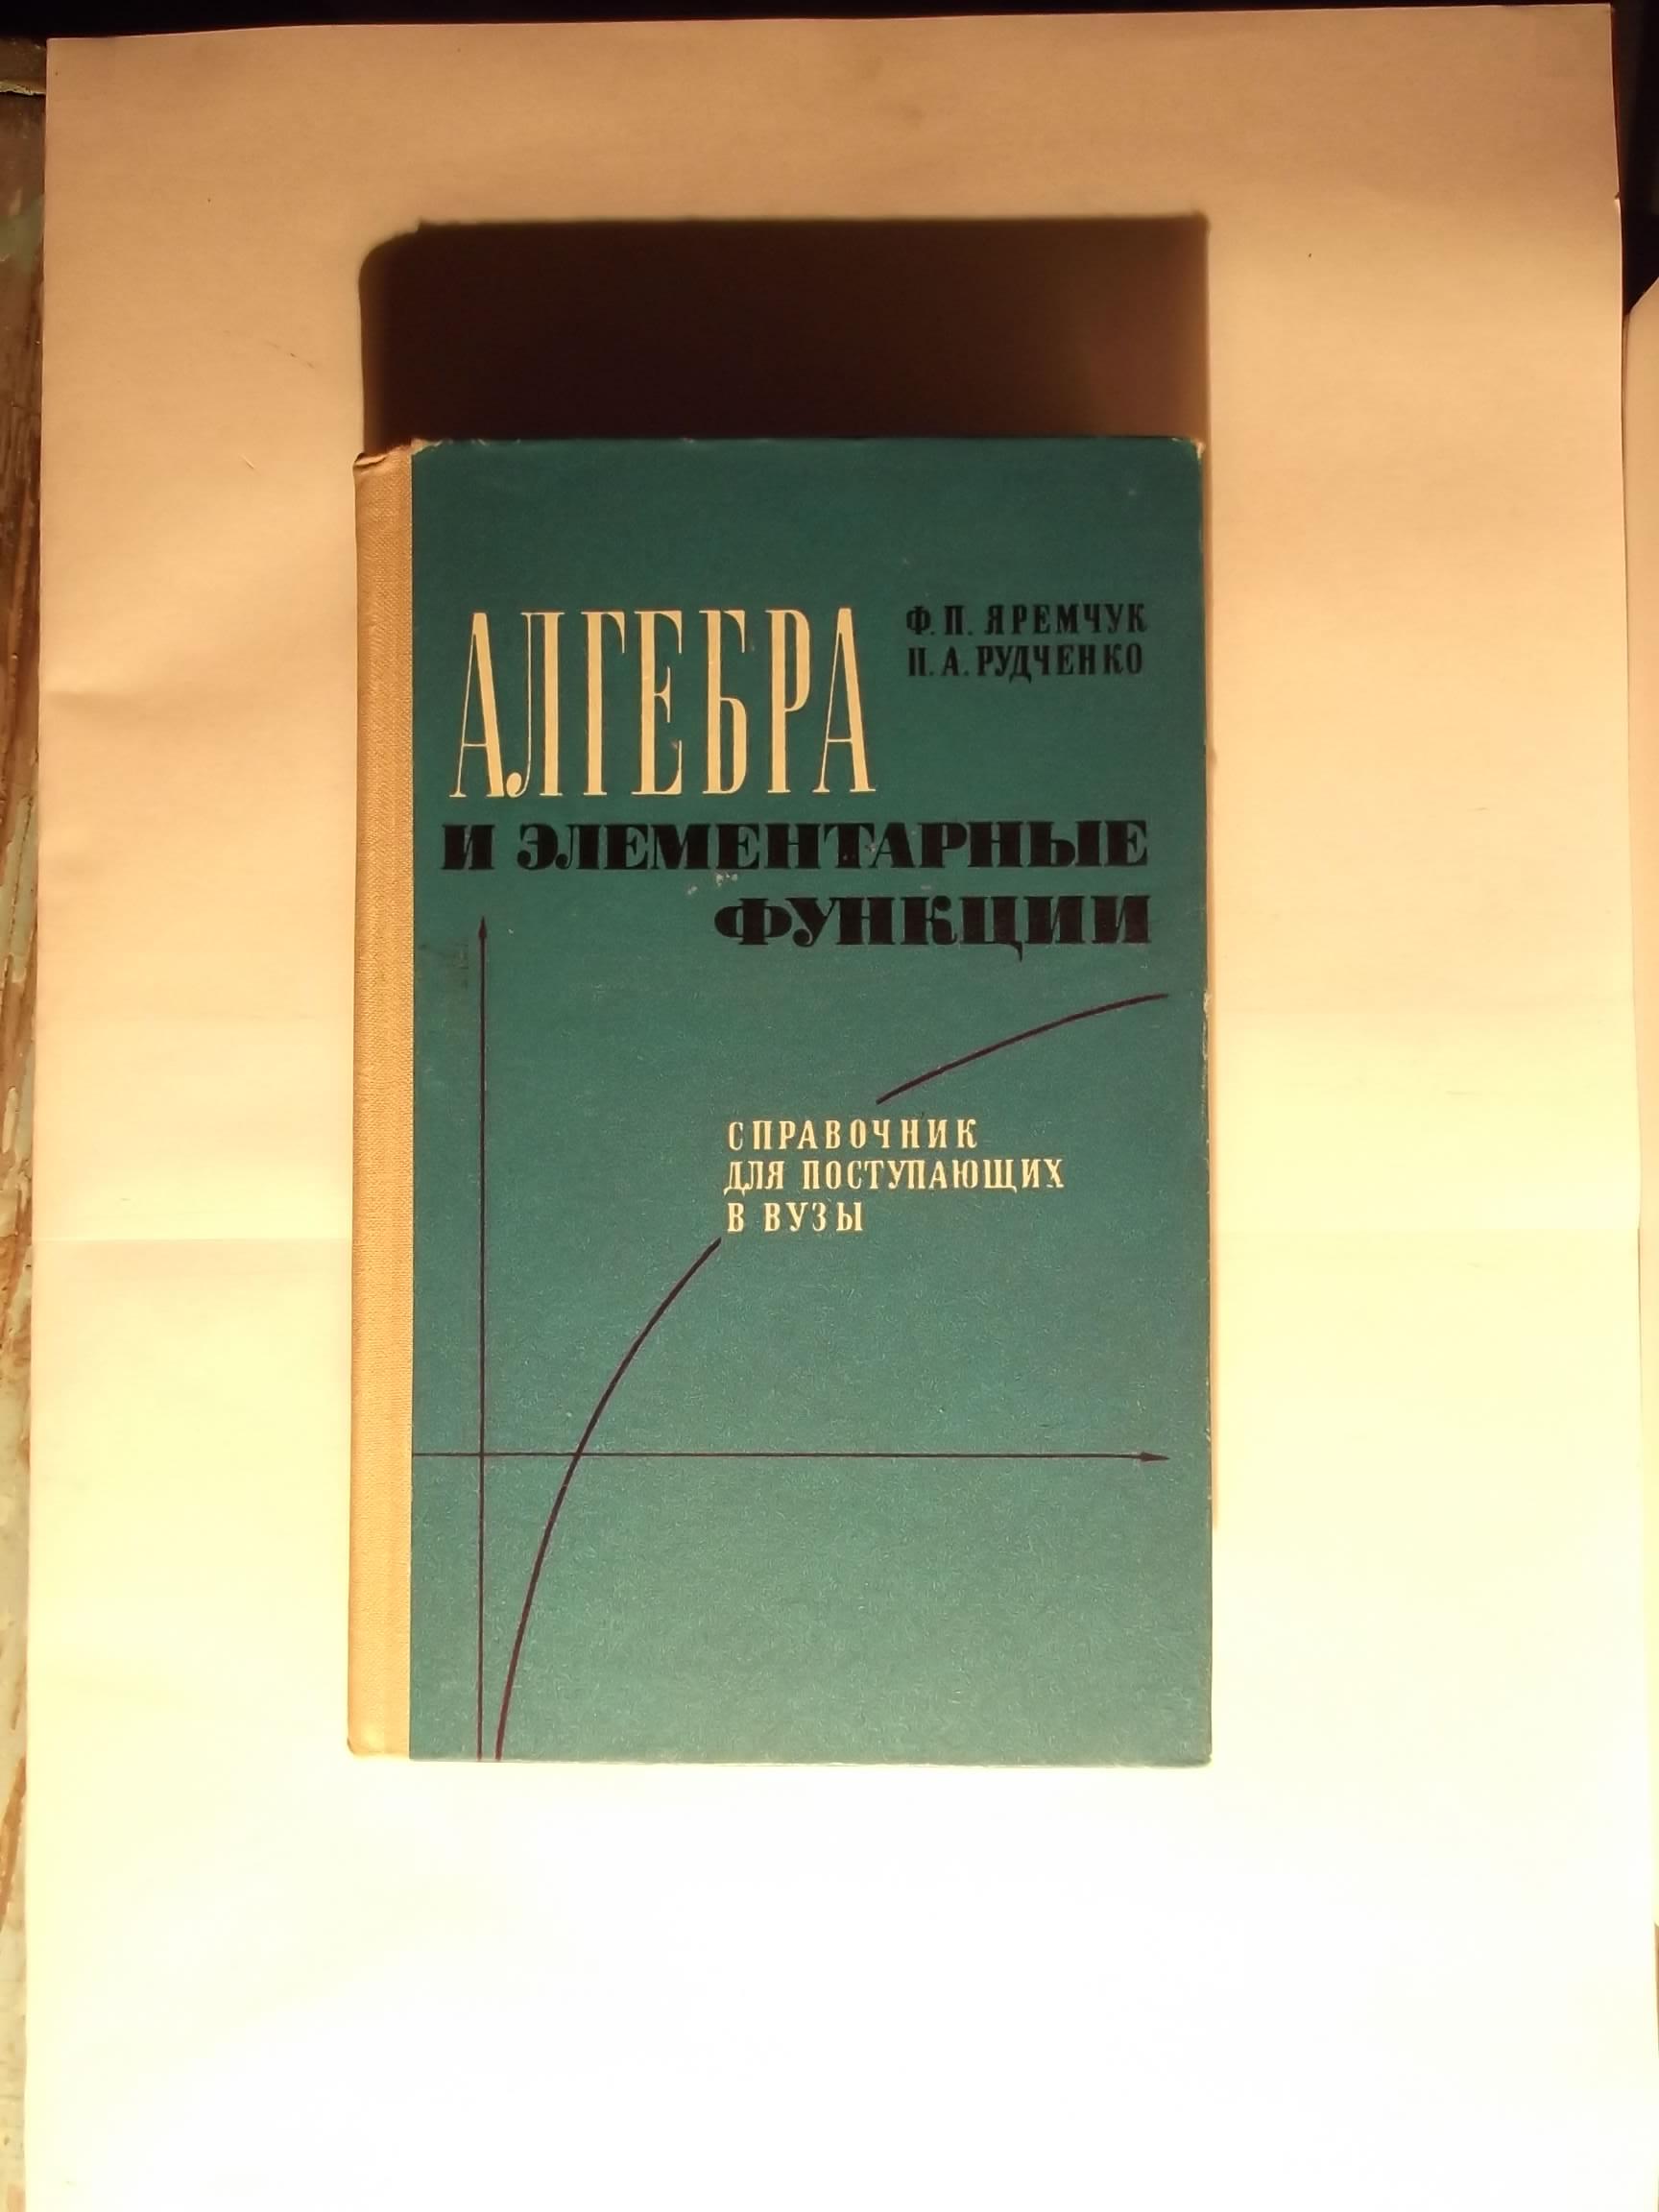 теореческий справочник по алгебре